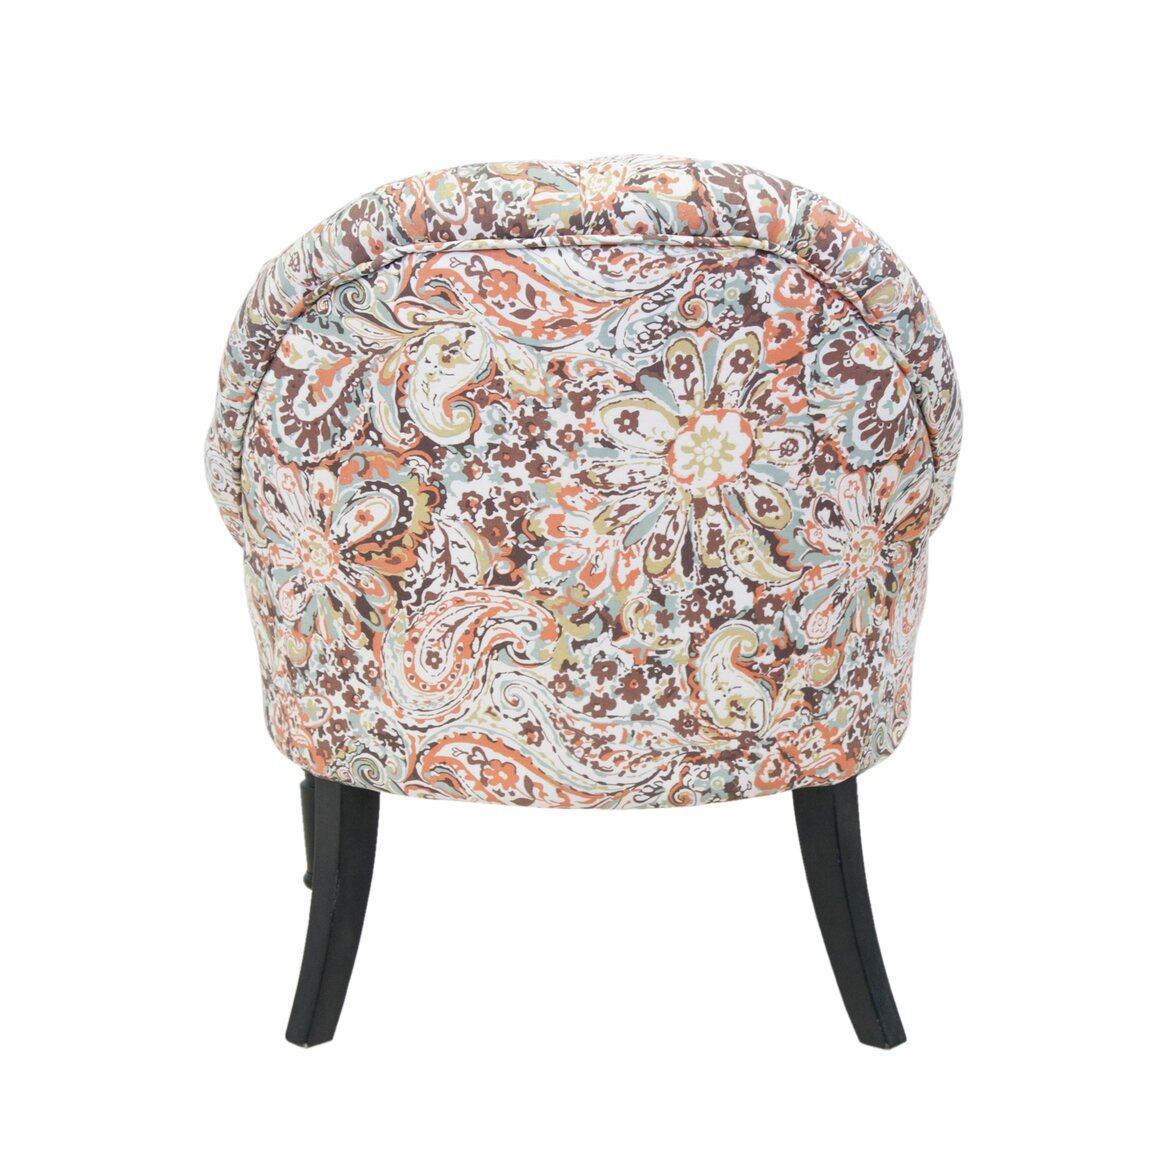 Кресло Desta orange flower 3 | Маленькие кресла Kingsby